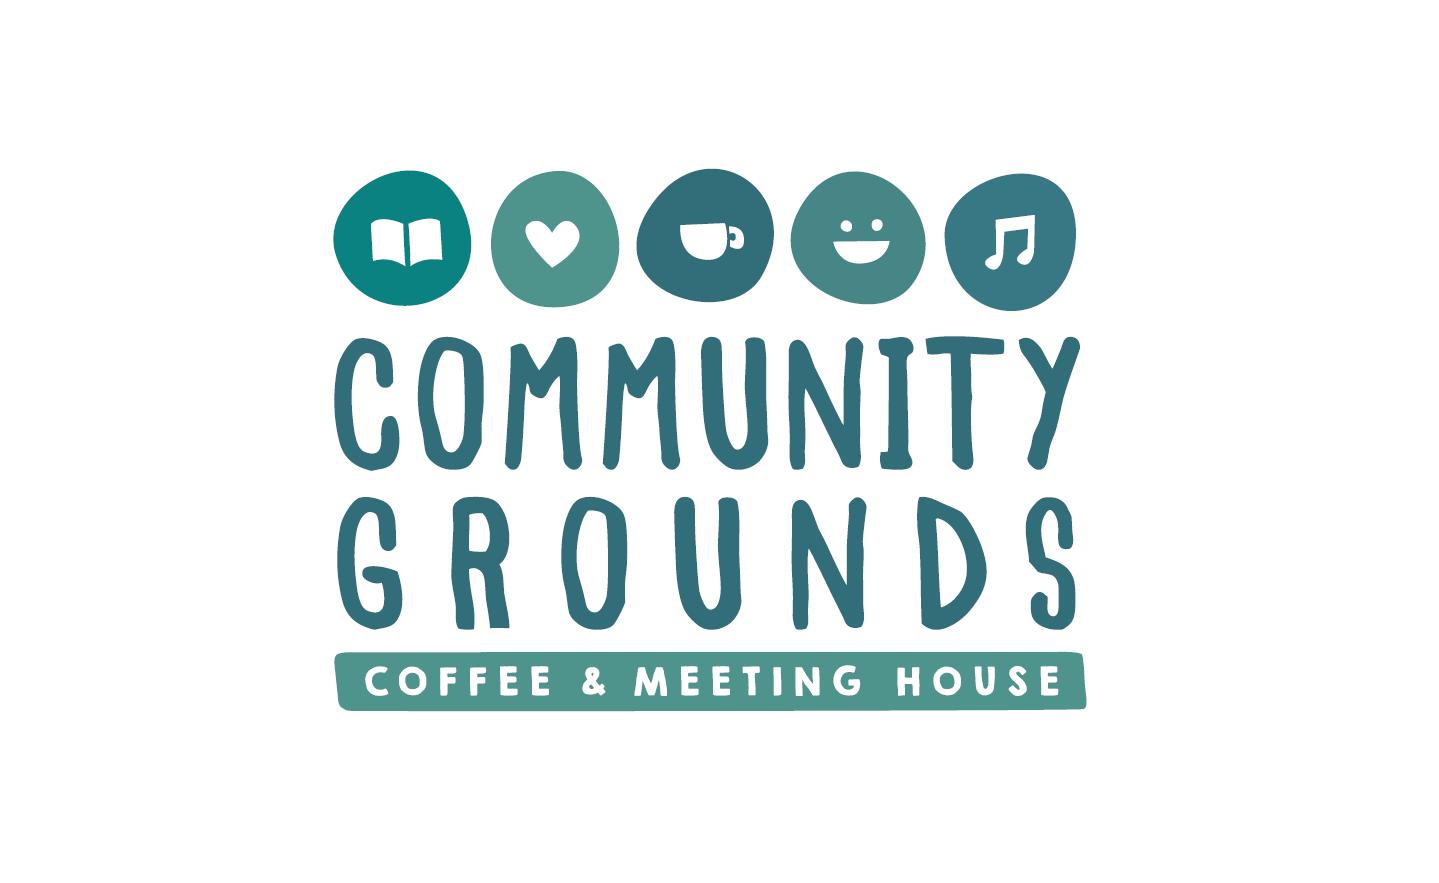 Community Grounds